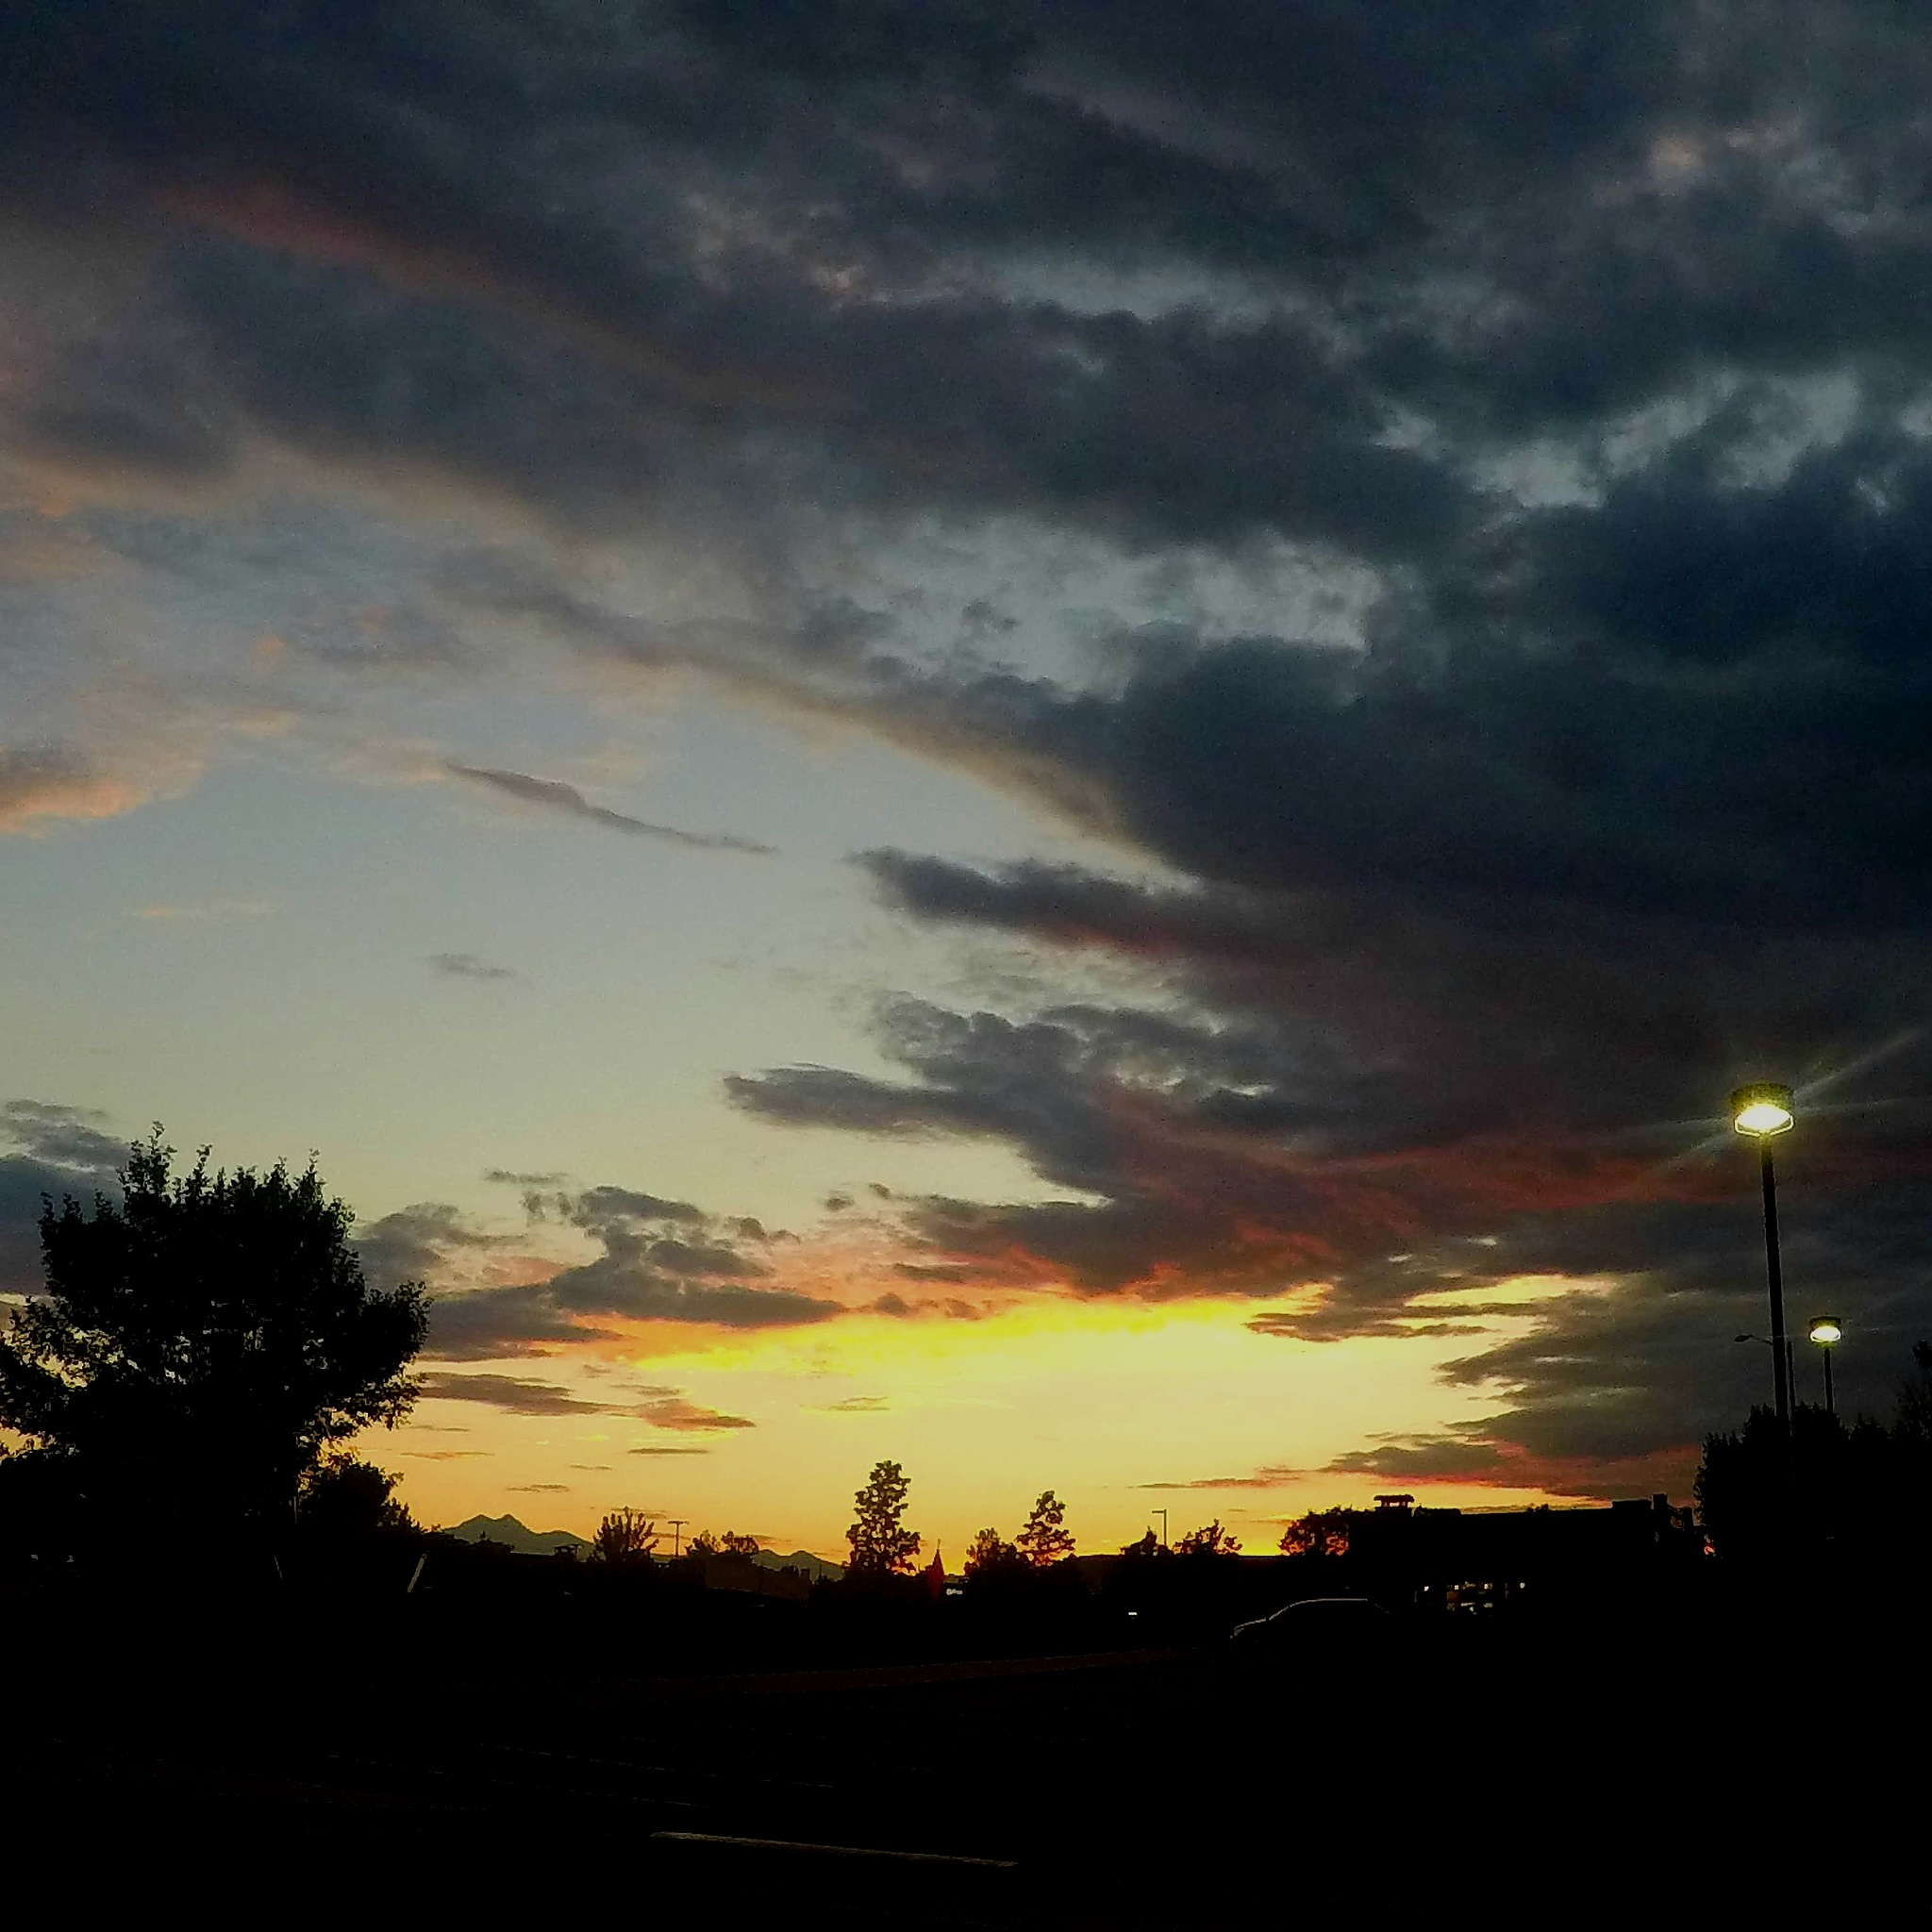 Sunset  by Gerry Kraaijenbrink